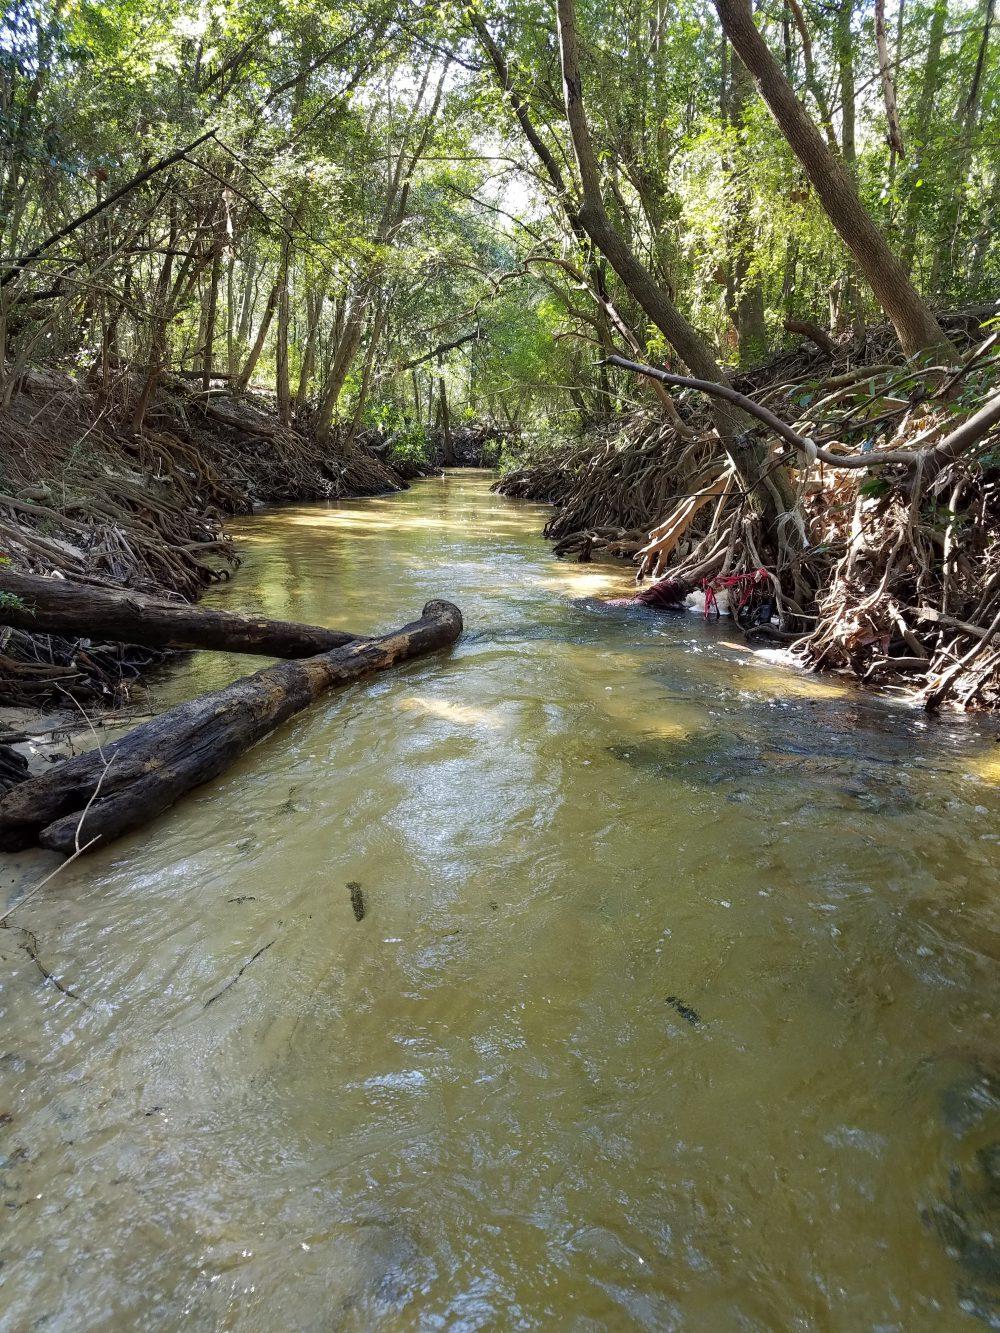 Summer Rain in the Florida Panhandle